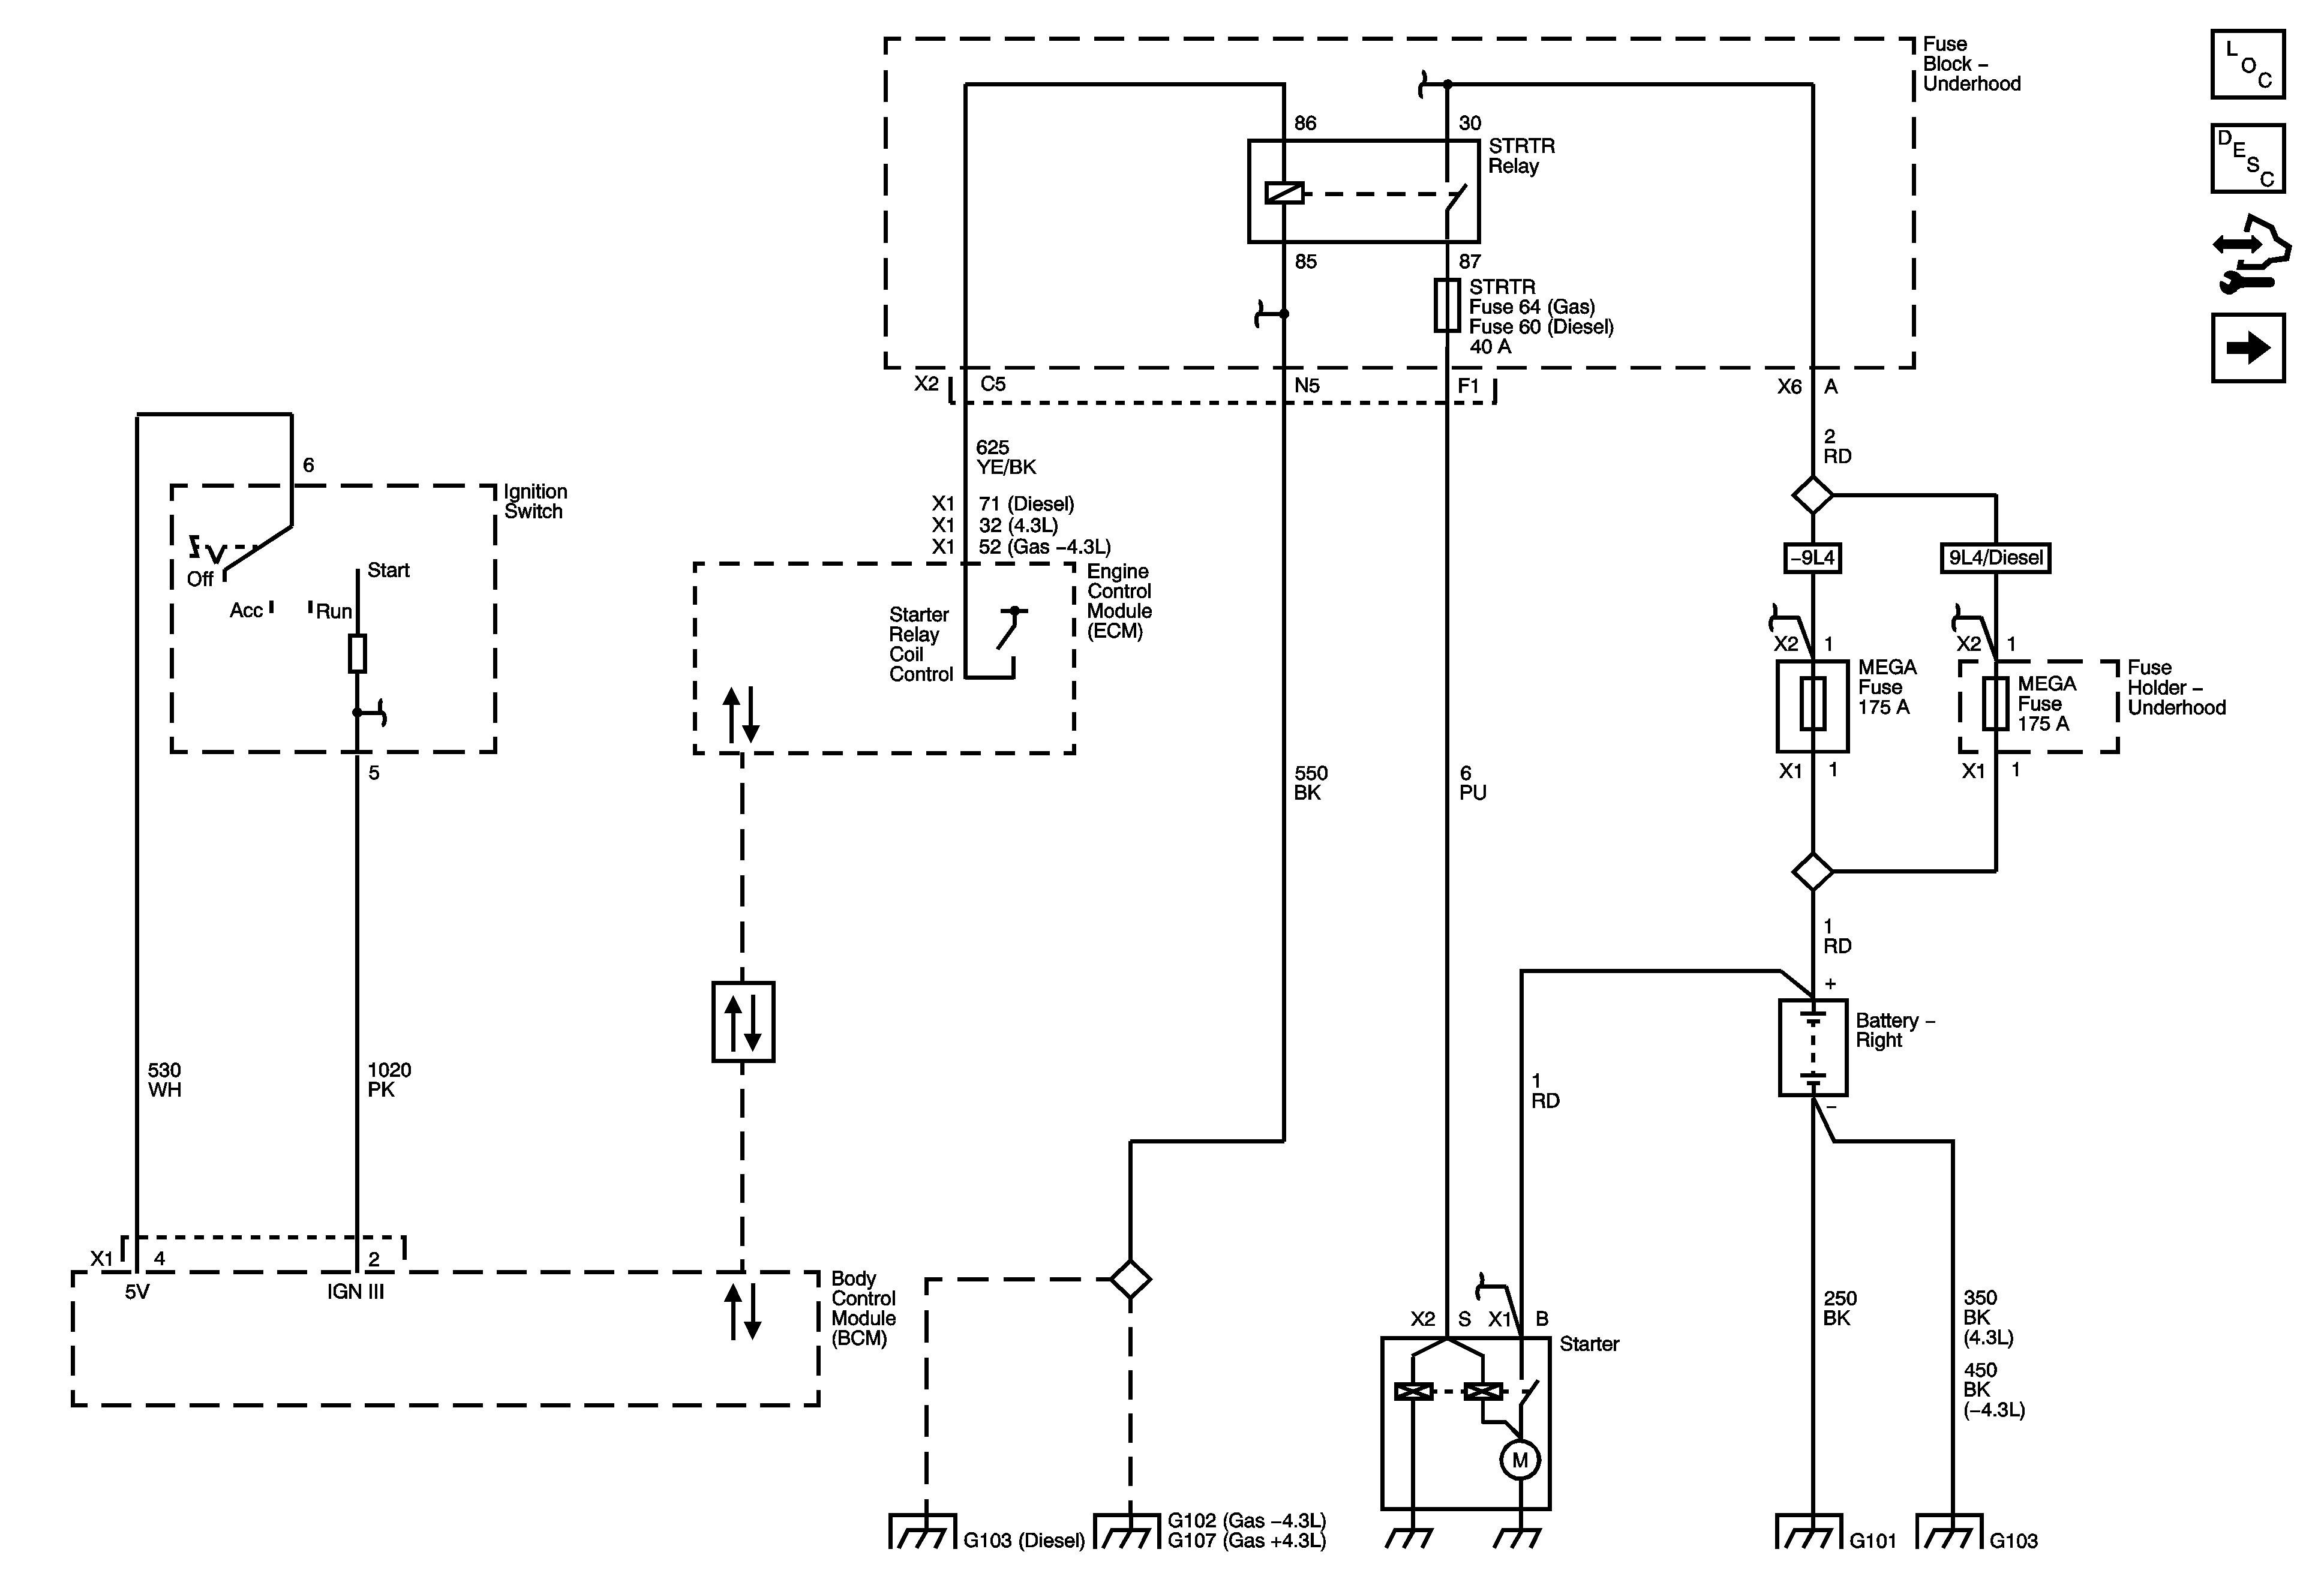 Silverado Hd Wiring Diagram Cruise Control Steering Wheel Graphic diagram schematic wiring diagram house